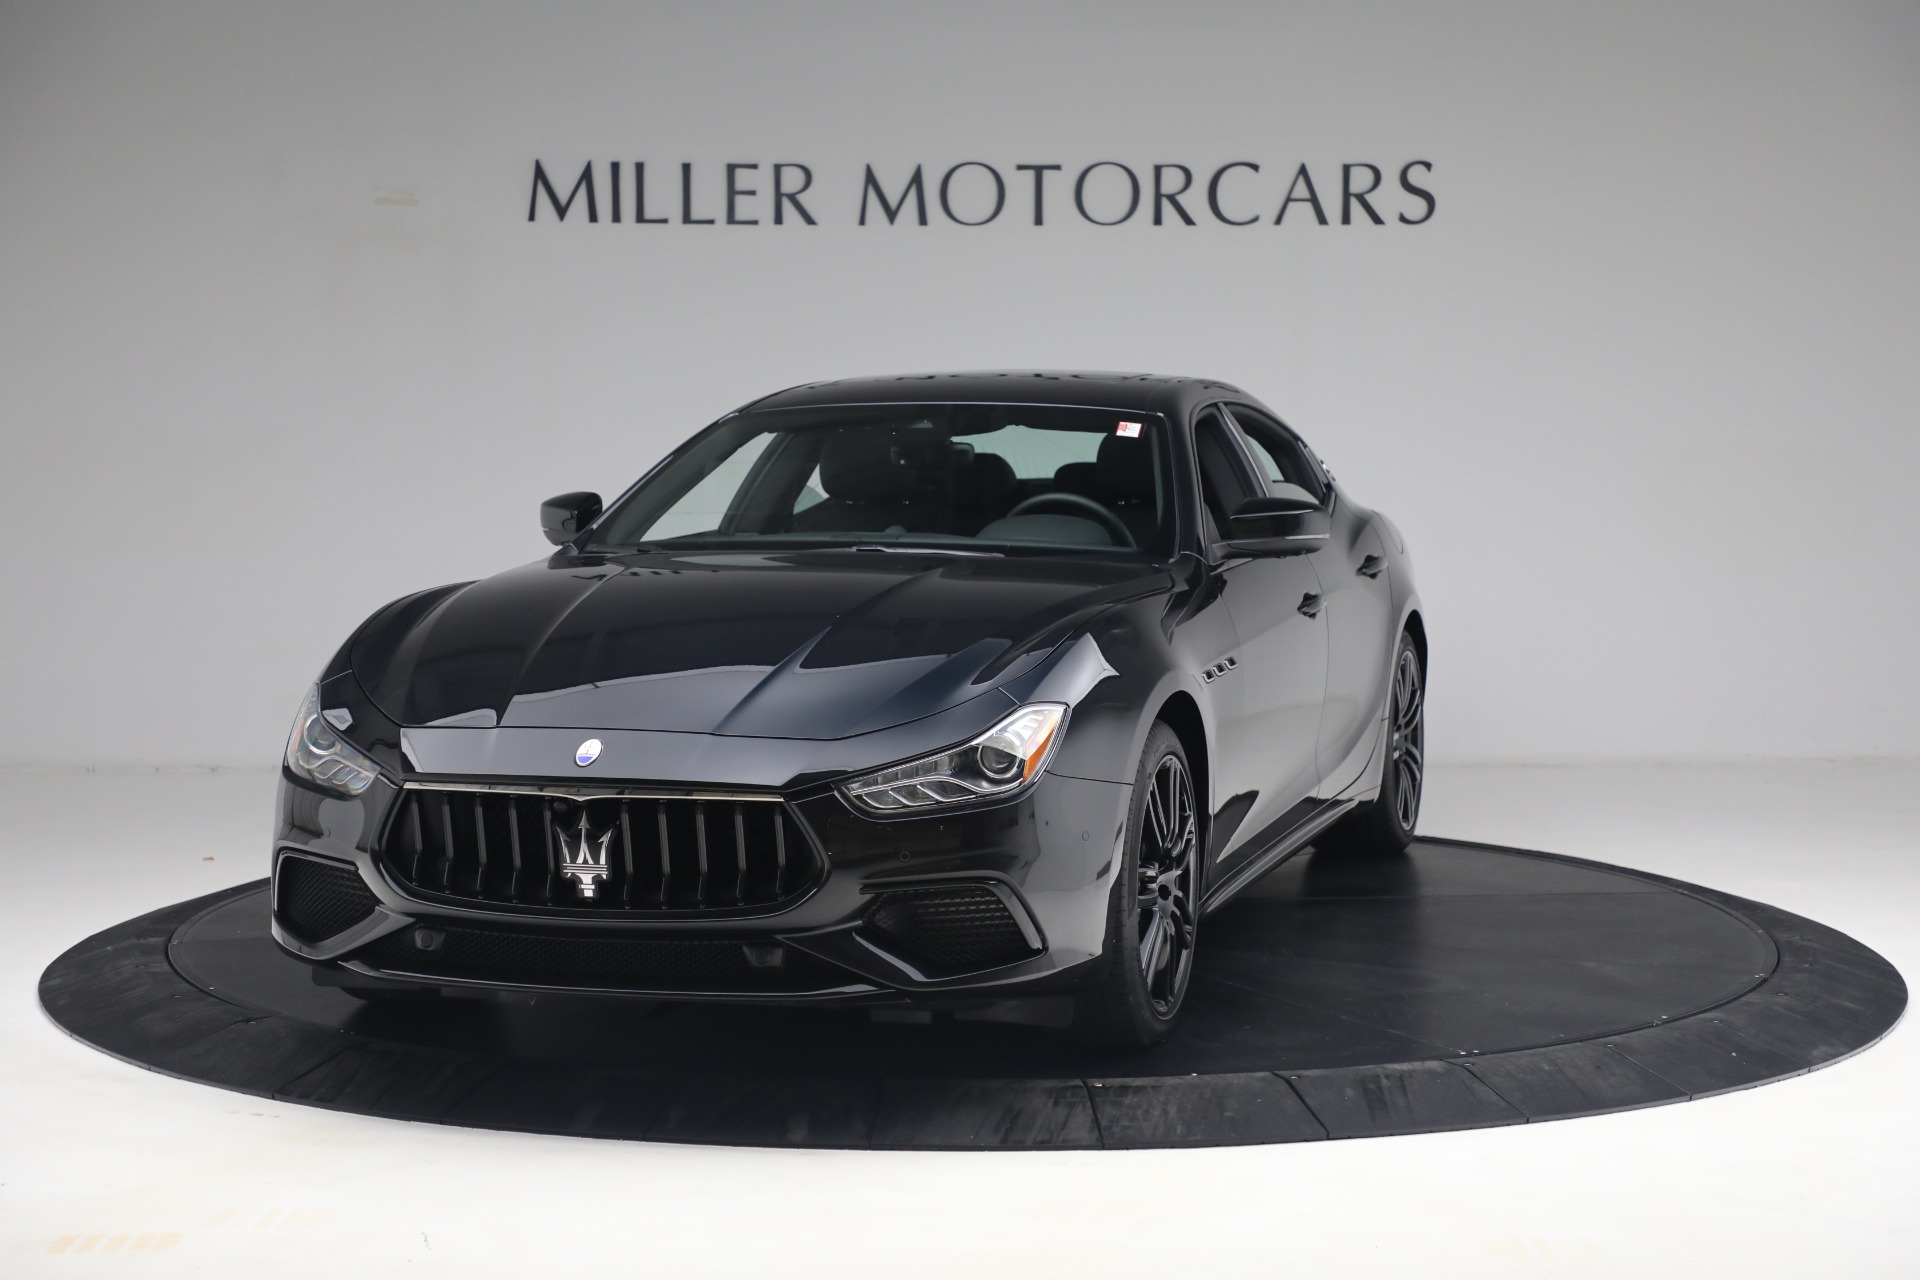 New 2021 Maserati Ghibli SQ4 for sale $92,894 at Rolls-Royce Motor Cars Greenwich in Greenwich CT 06830 1